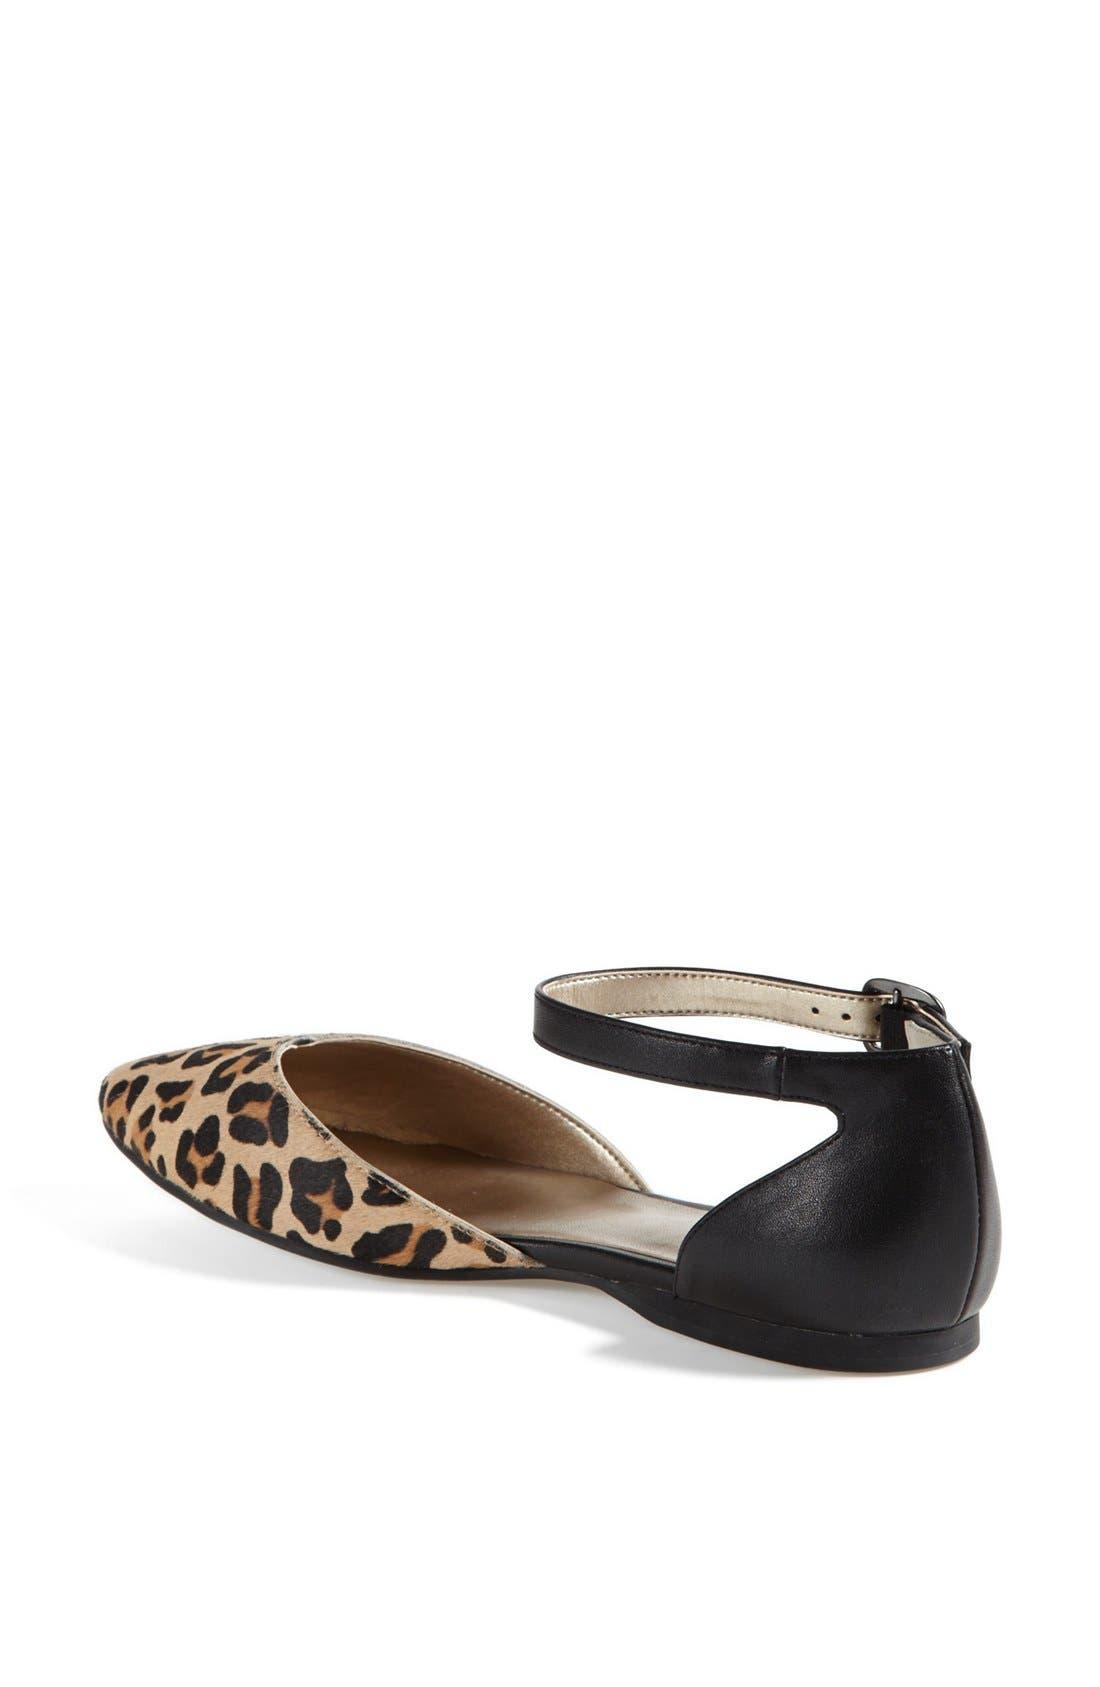 Alternate Image 2  - BP. 'Gillie' Ankle Strap Flat